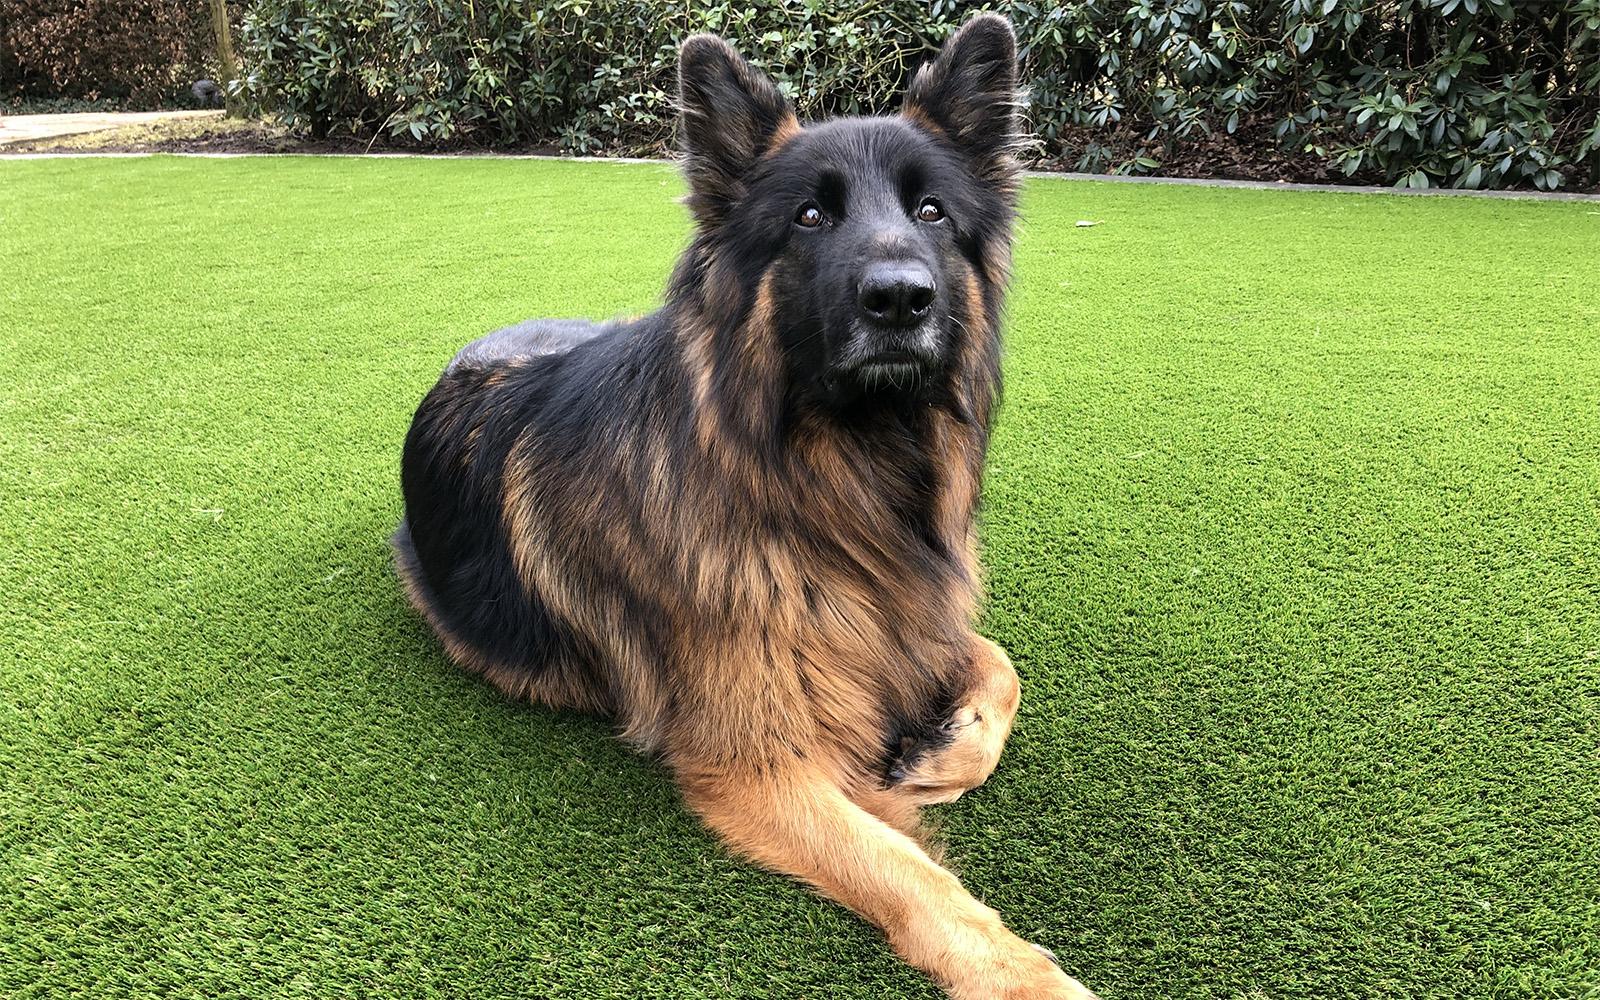 Kunstgras speciaal voor honden, Royal Grass, Kunstgras, Royal Grass, Huisdieren, Recycling , Gazon, Gras, Tuin